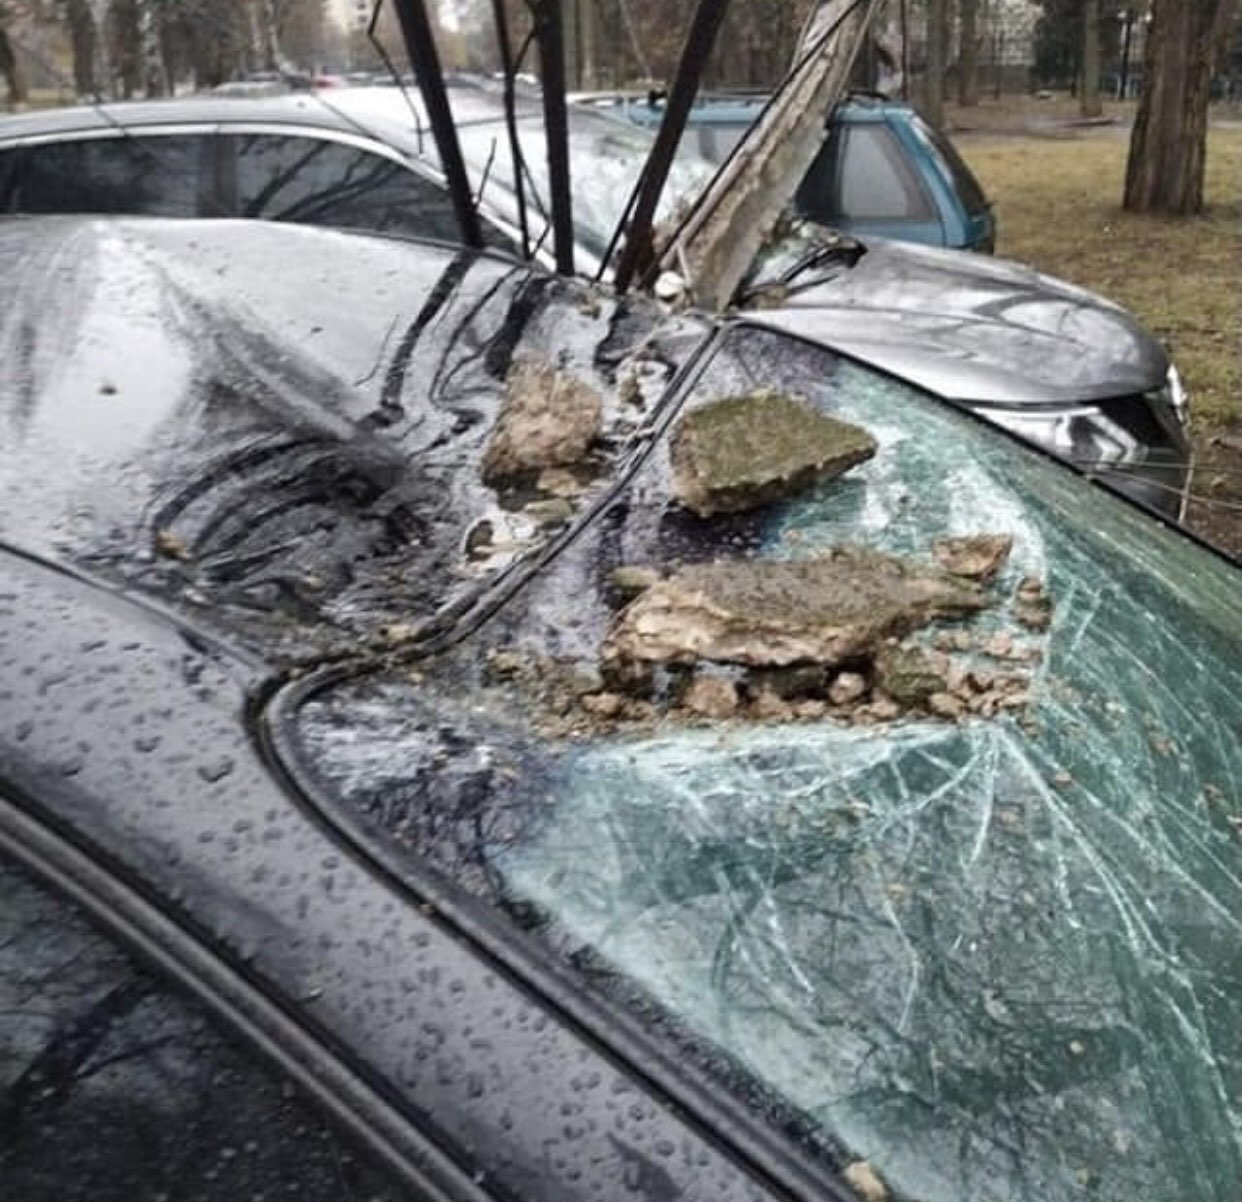 Упавший столб повредил три автомобиля.